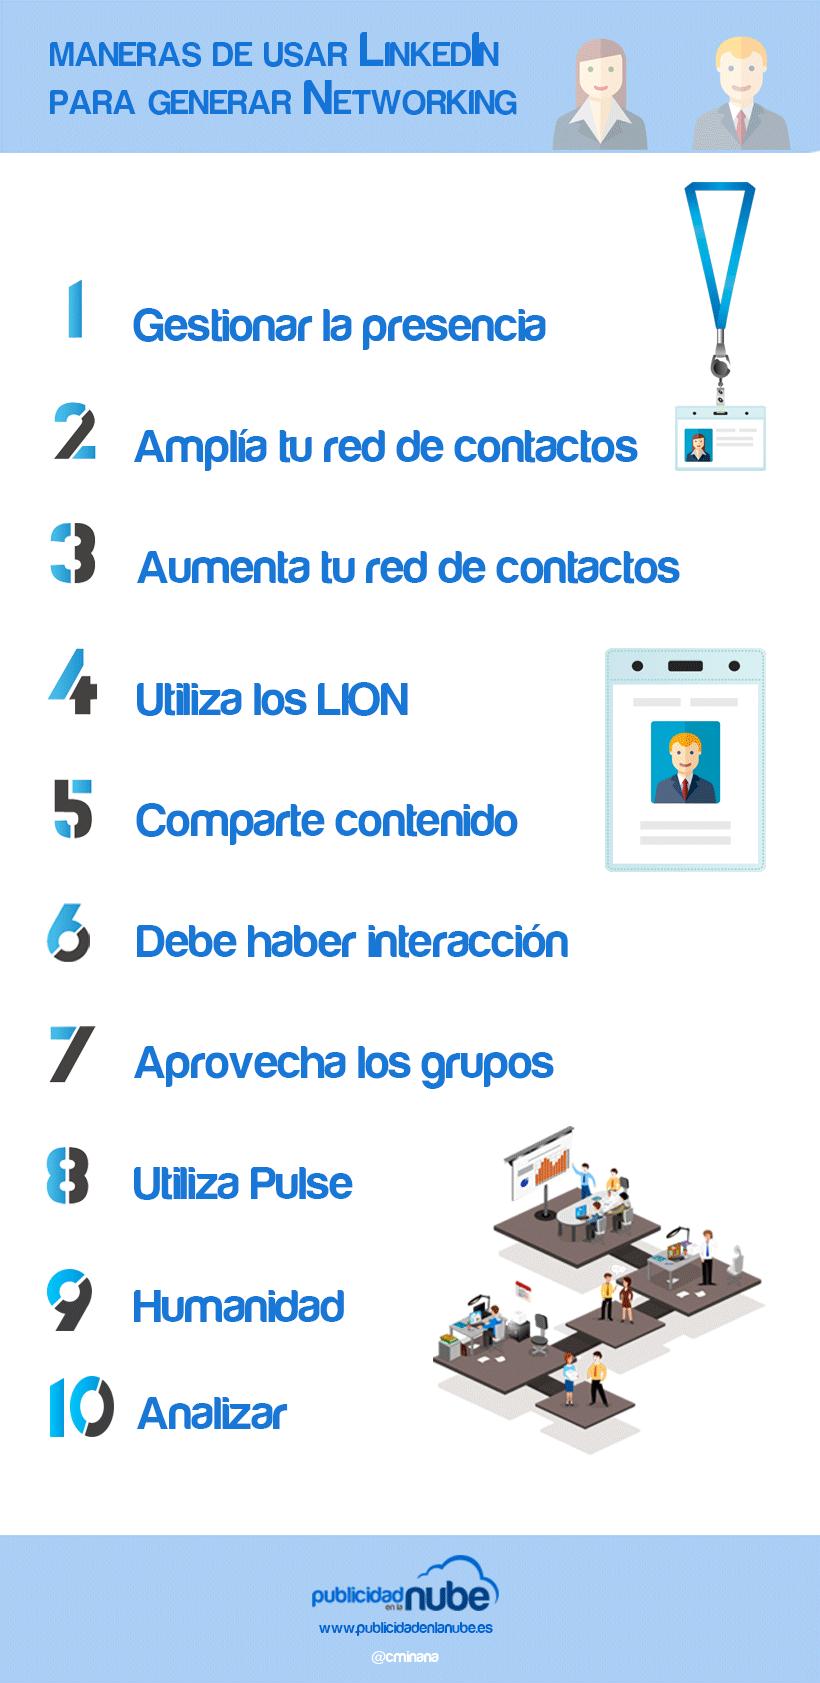 10 maneras de usar LinkedIn para generar networking